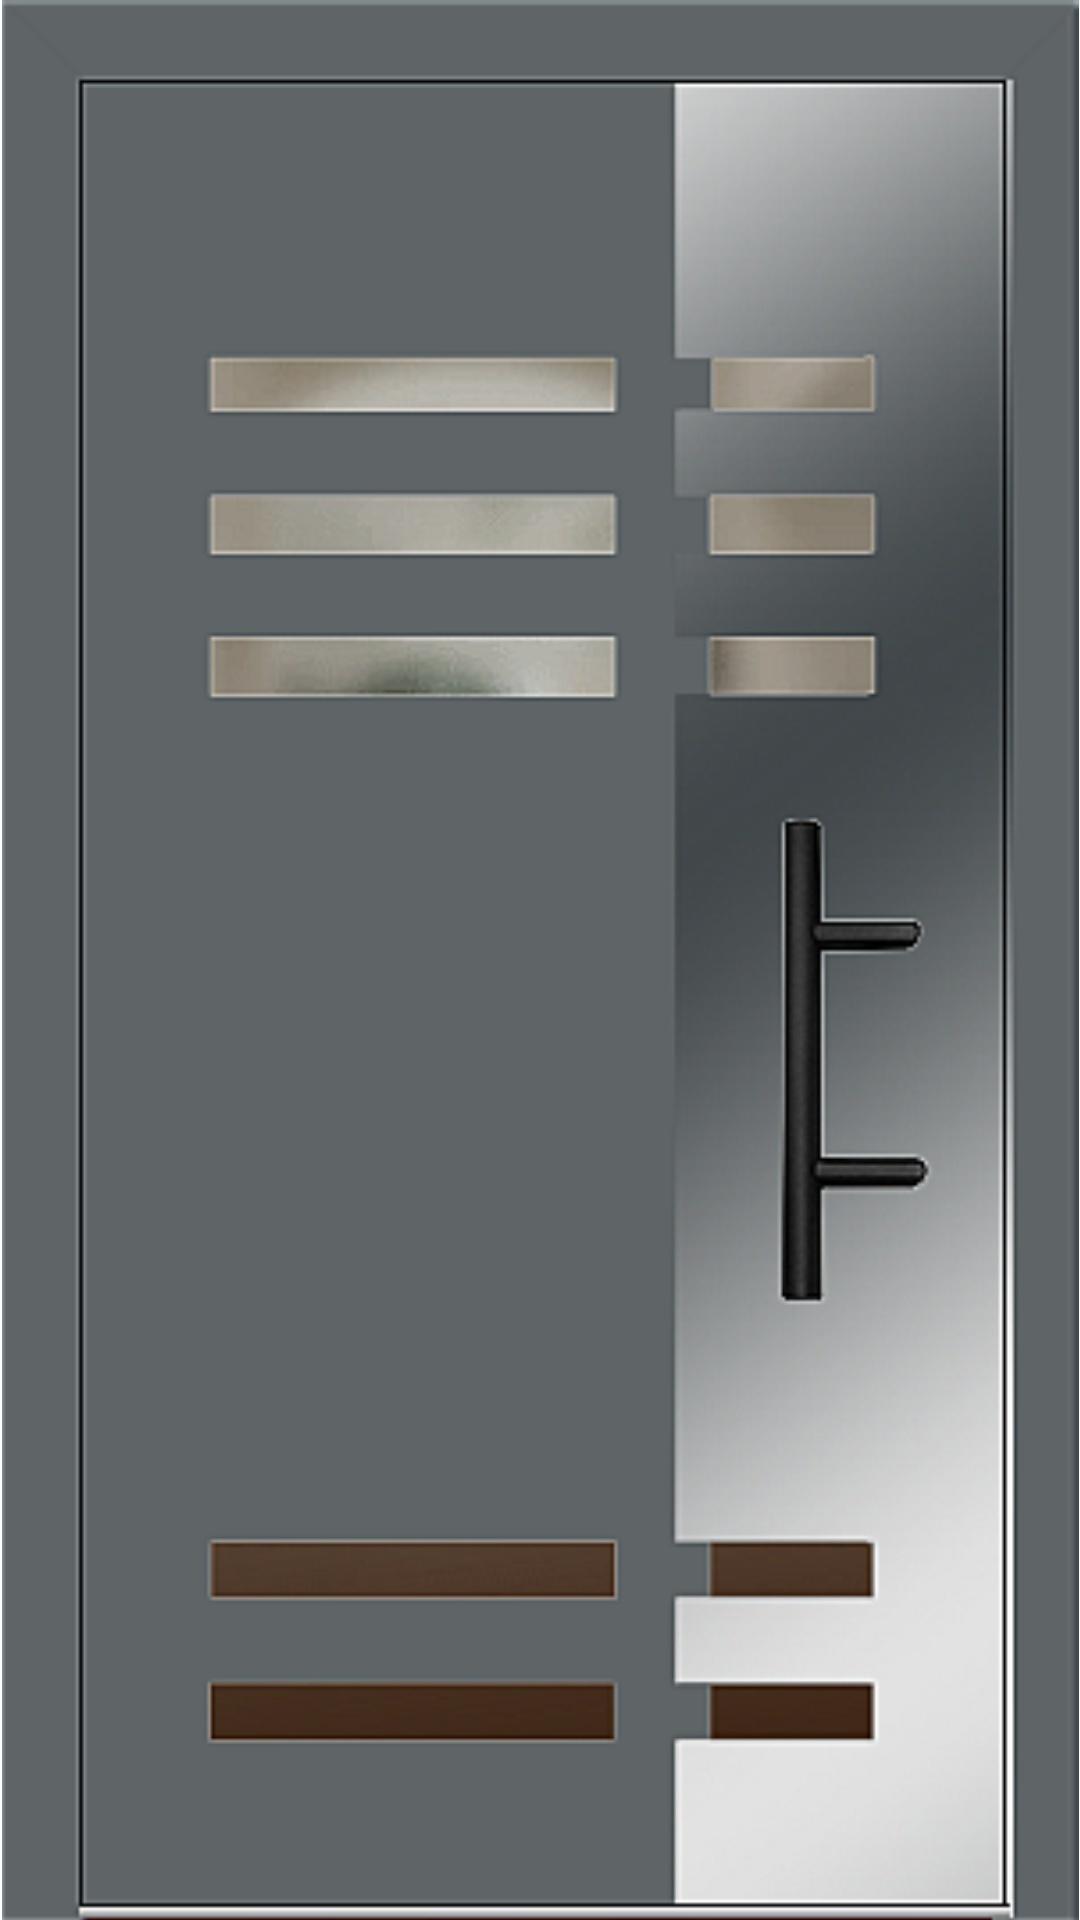 Holz-Alu Haustür Modell 66501 basaltgrau